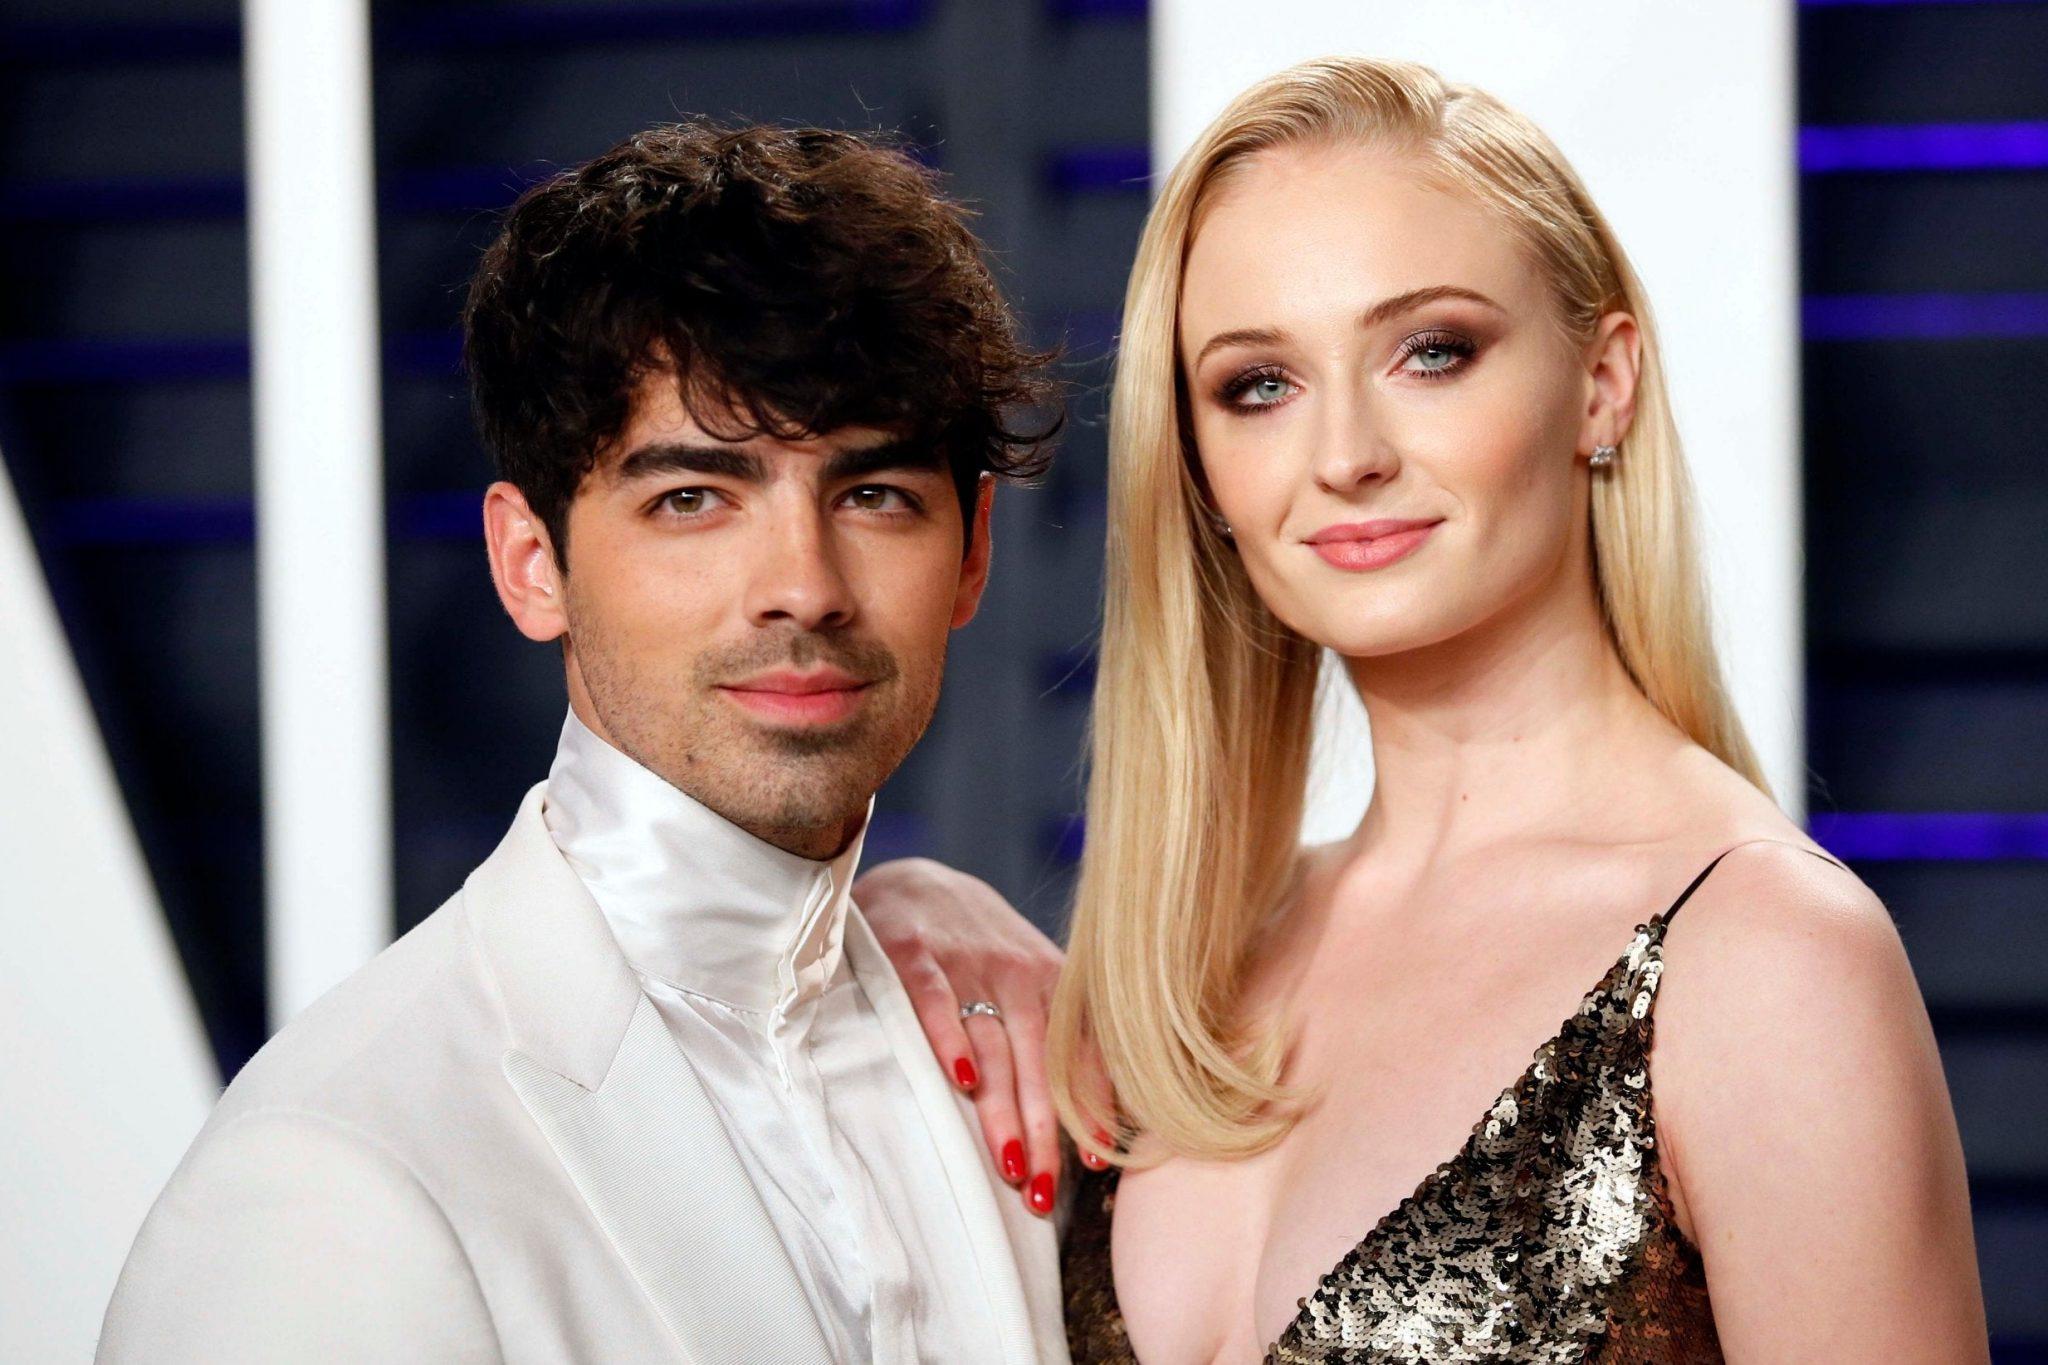 Sophie Turner αποκαλύπτει πως «μισούσε» τους Jonas Brothers πριν παντρευτεί τον Joe Jonas